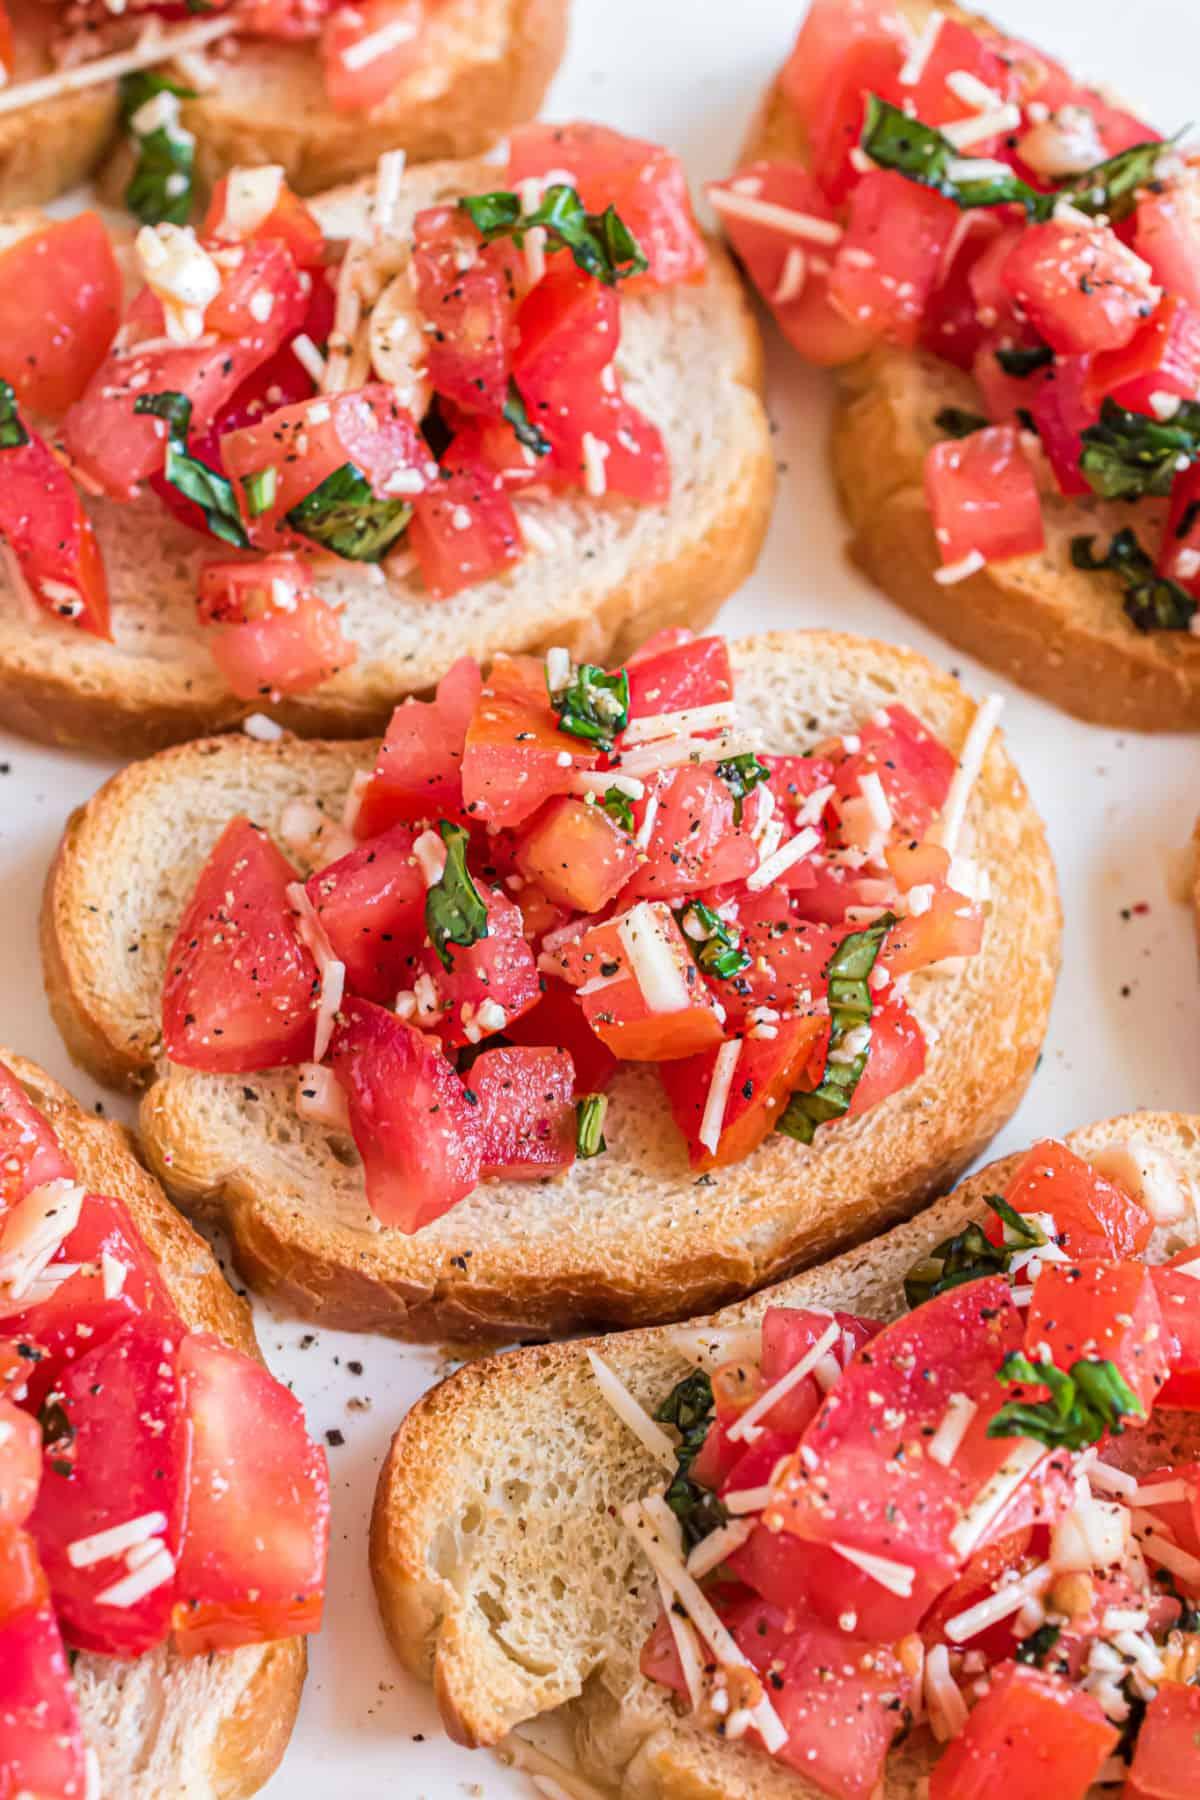 Bruschetta on small slices of toasted bread.